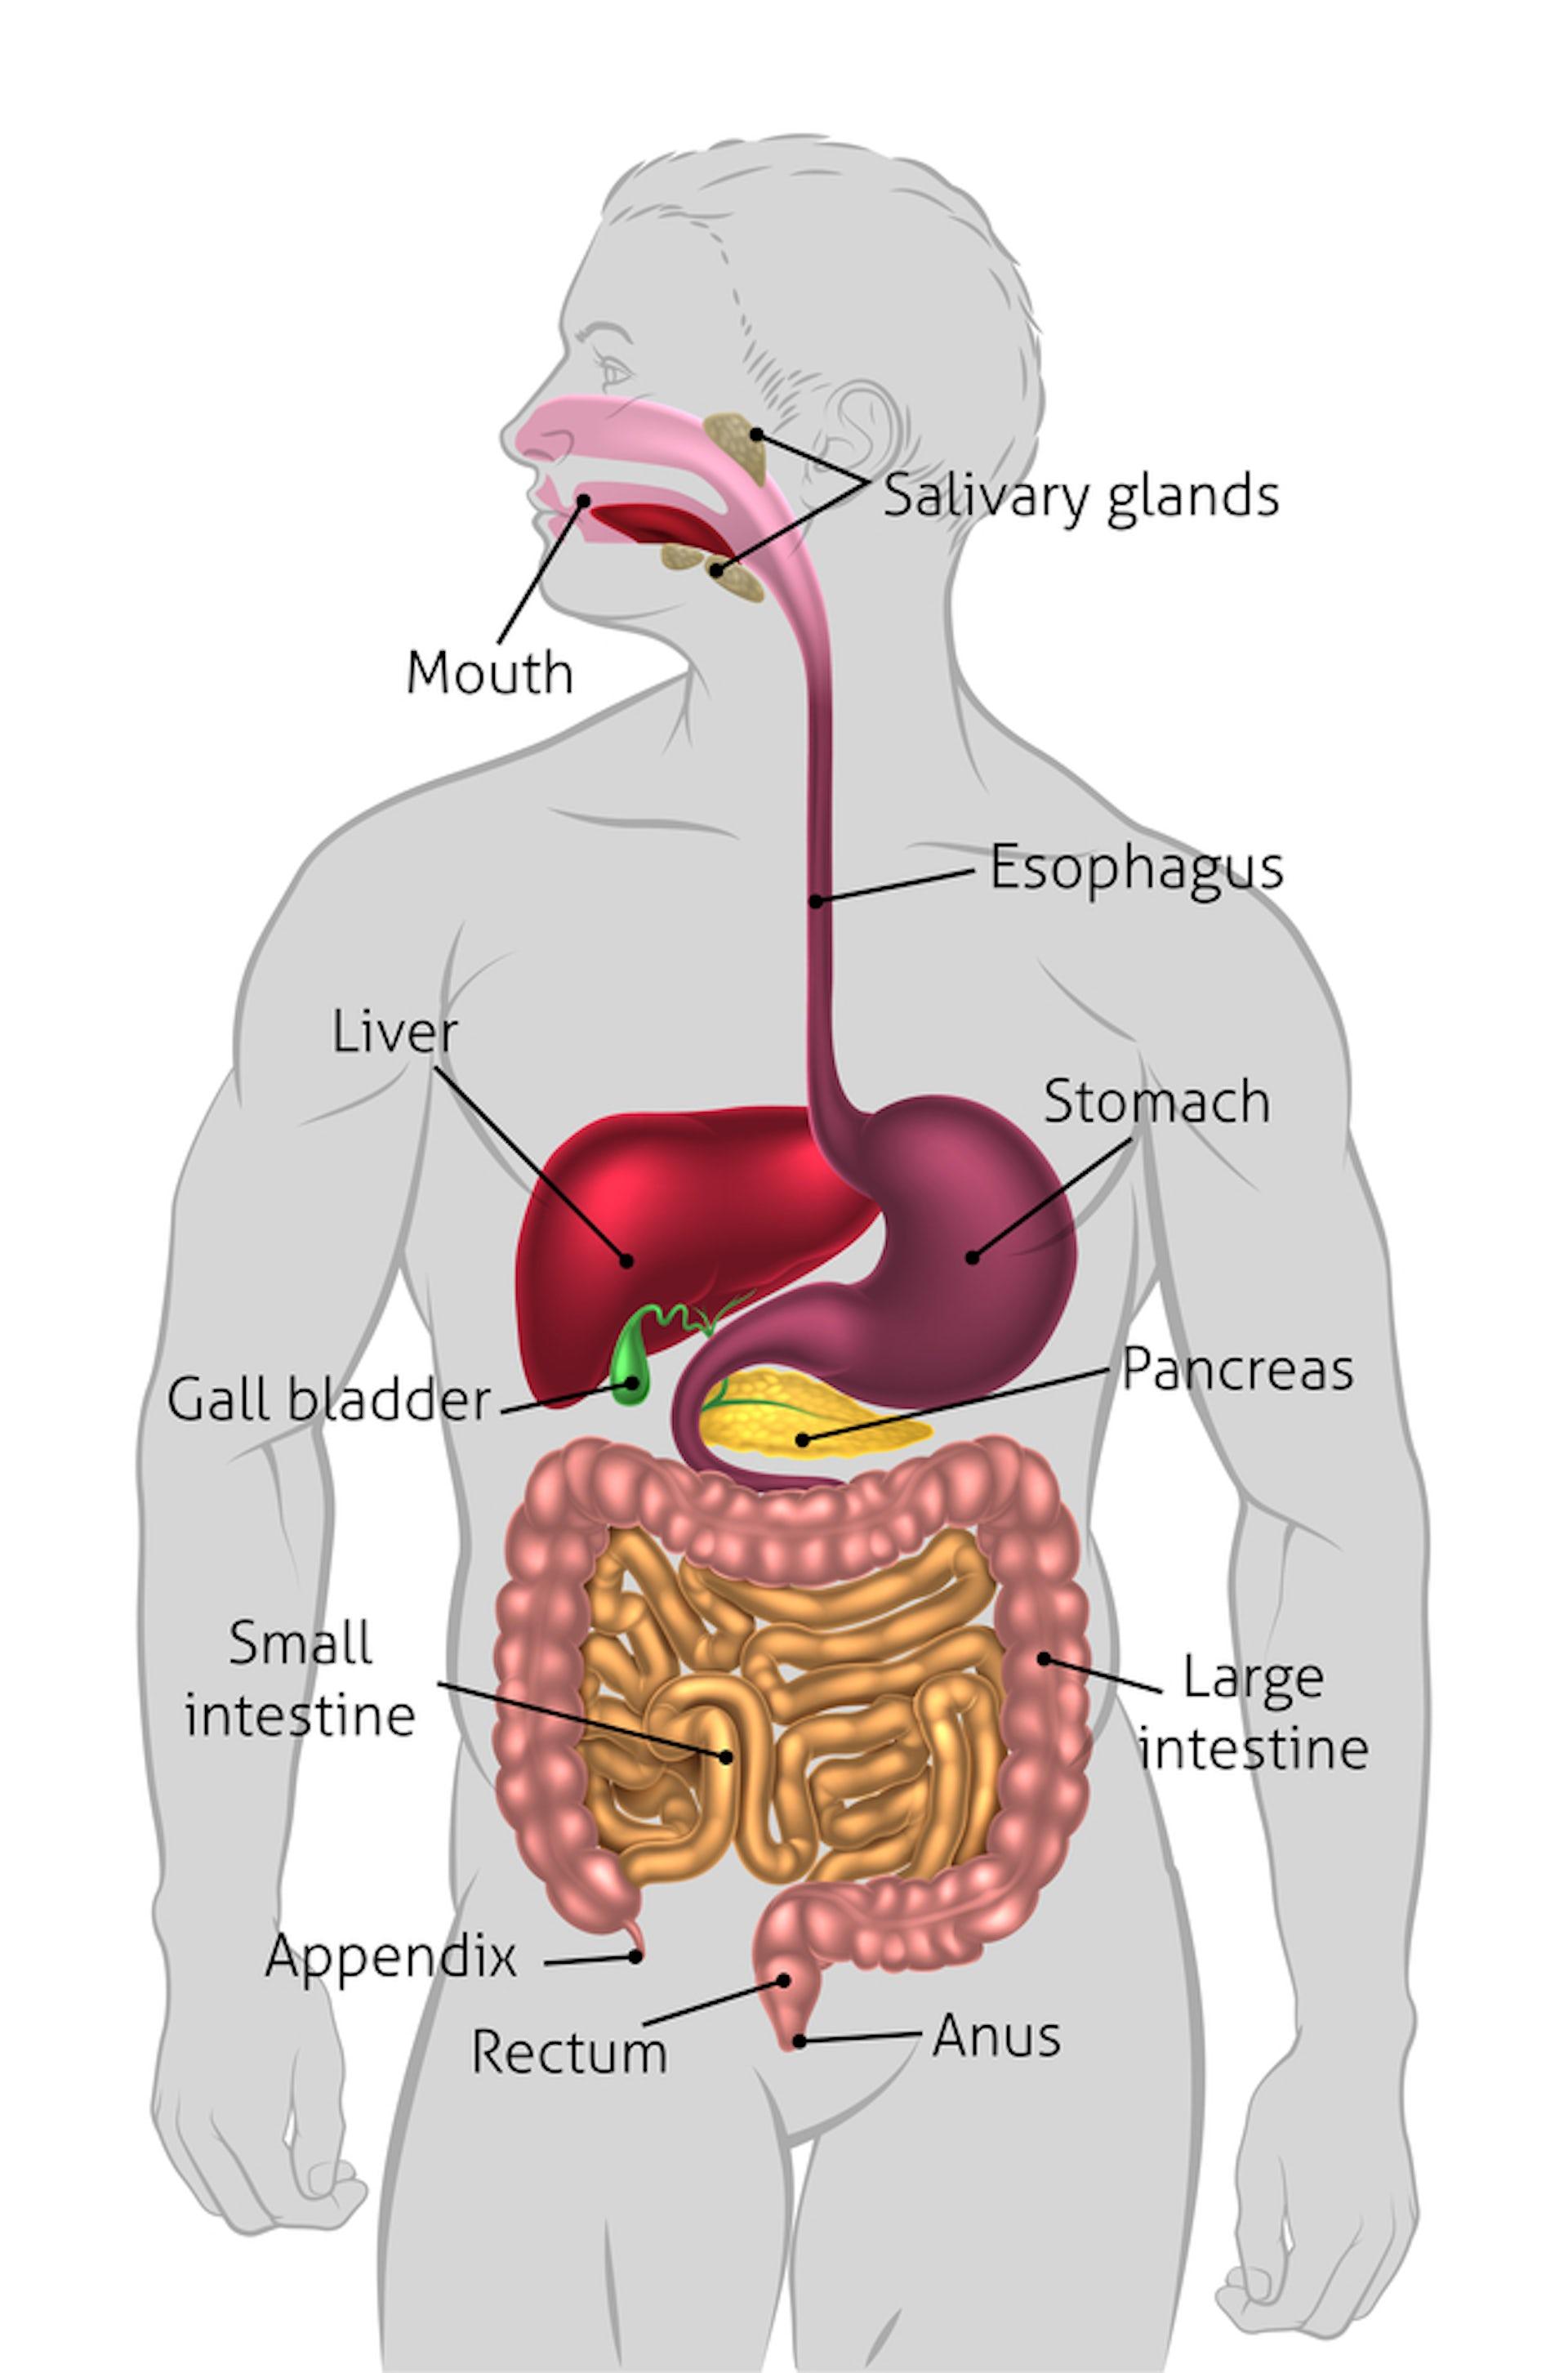 Diagram Of Gallbladder Location In Body Wiring Circuit